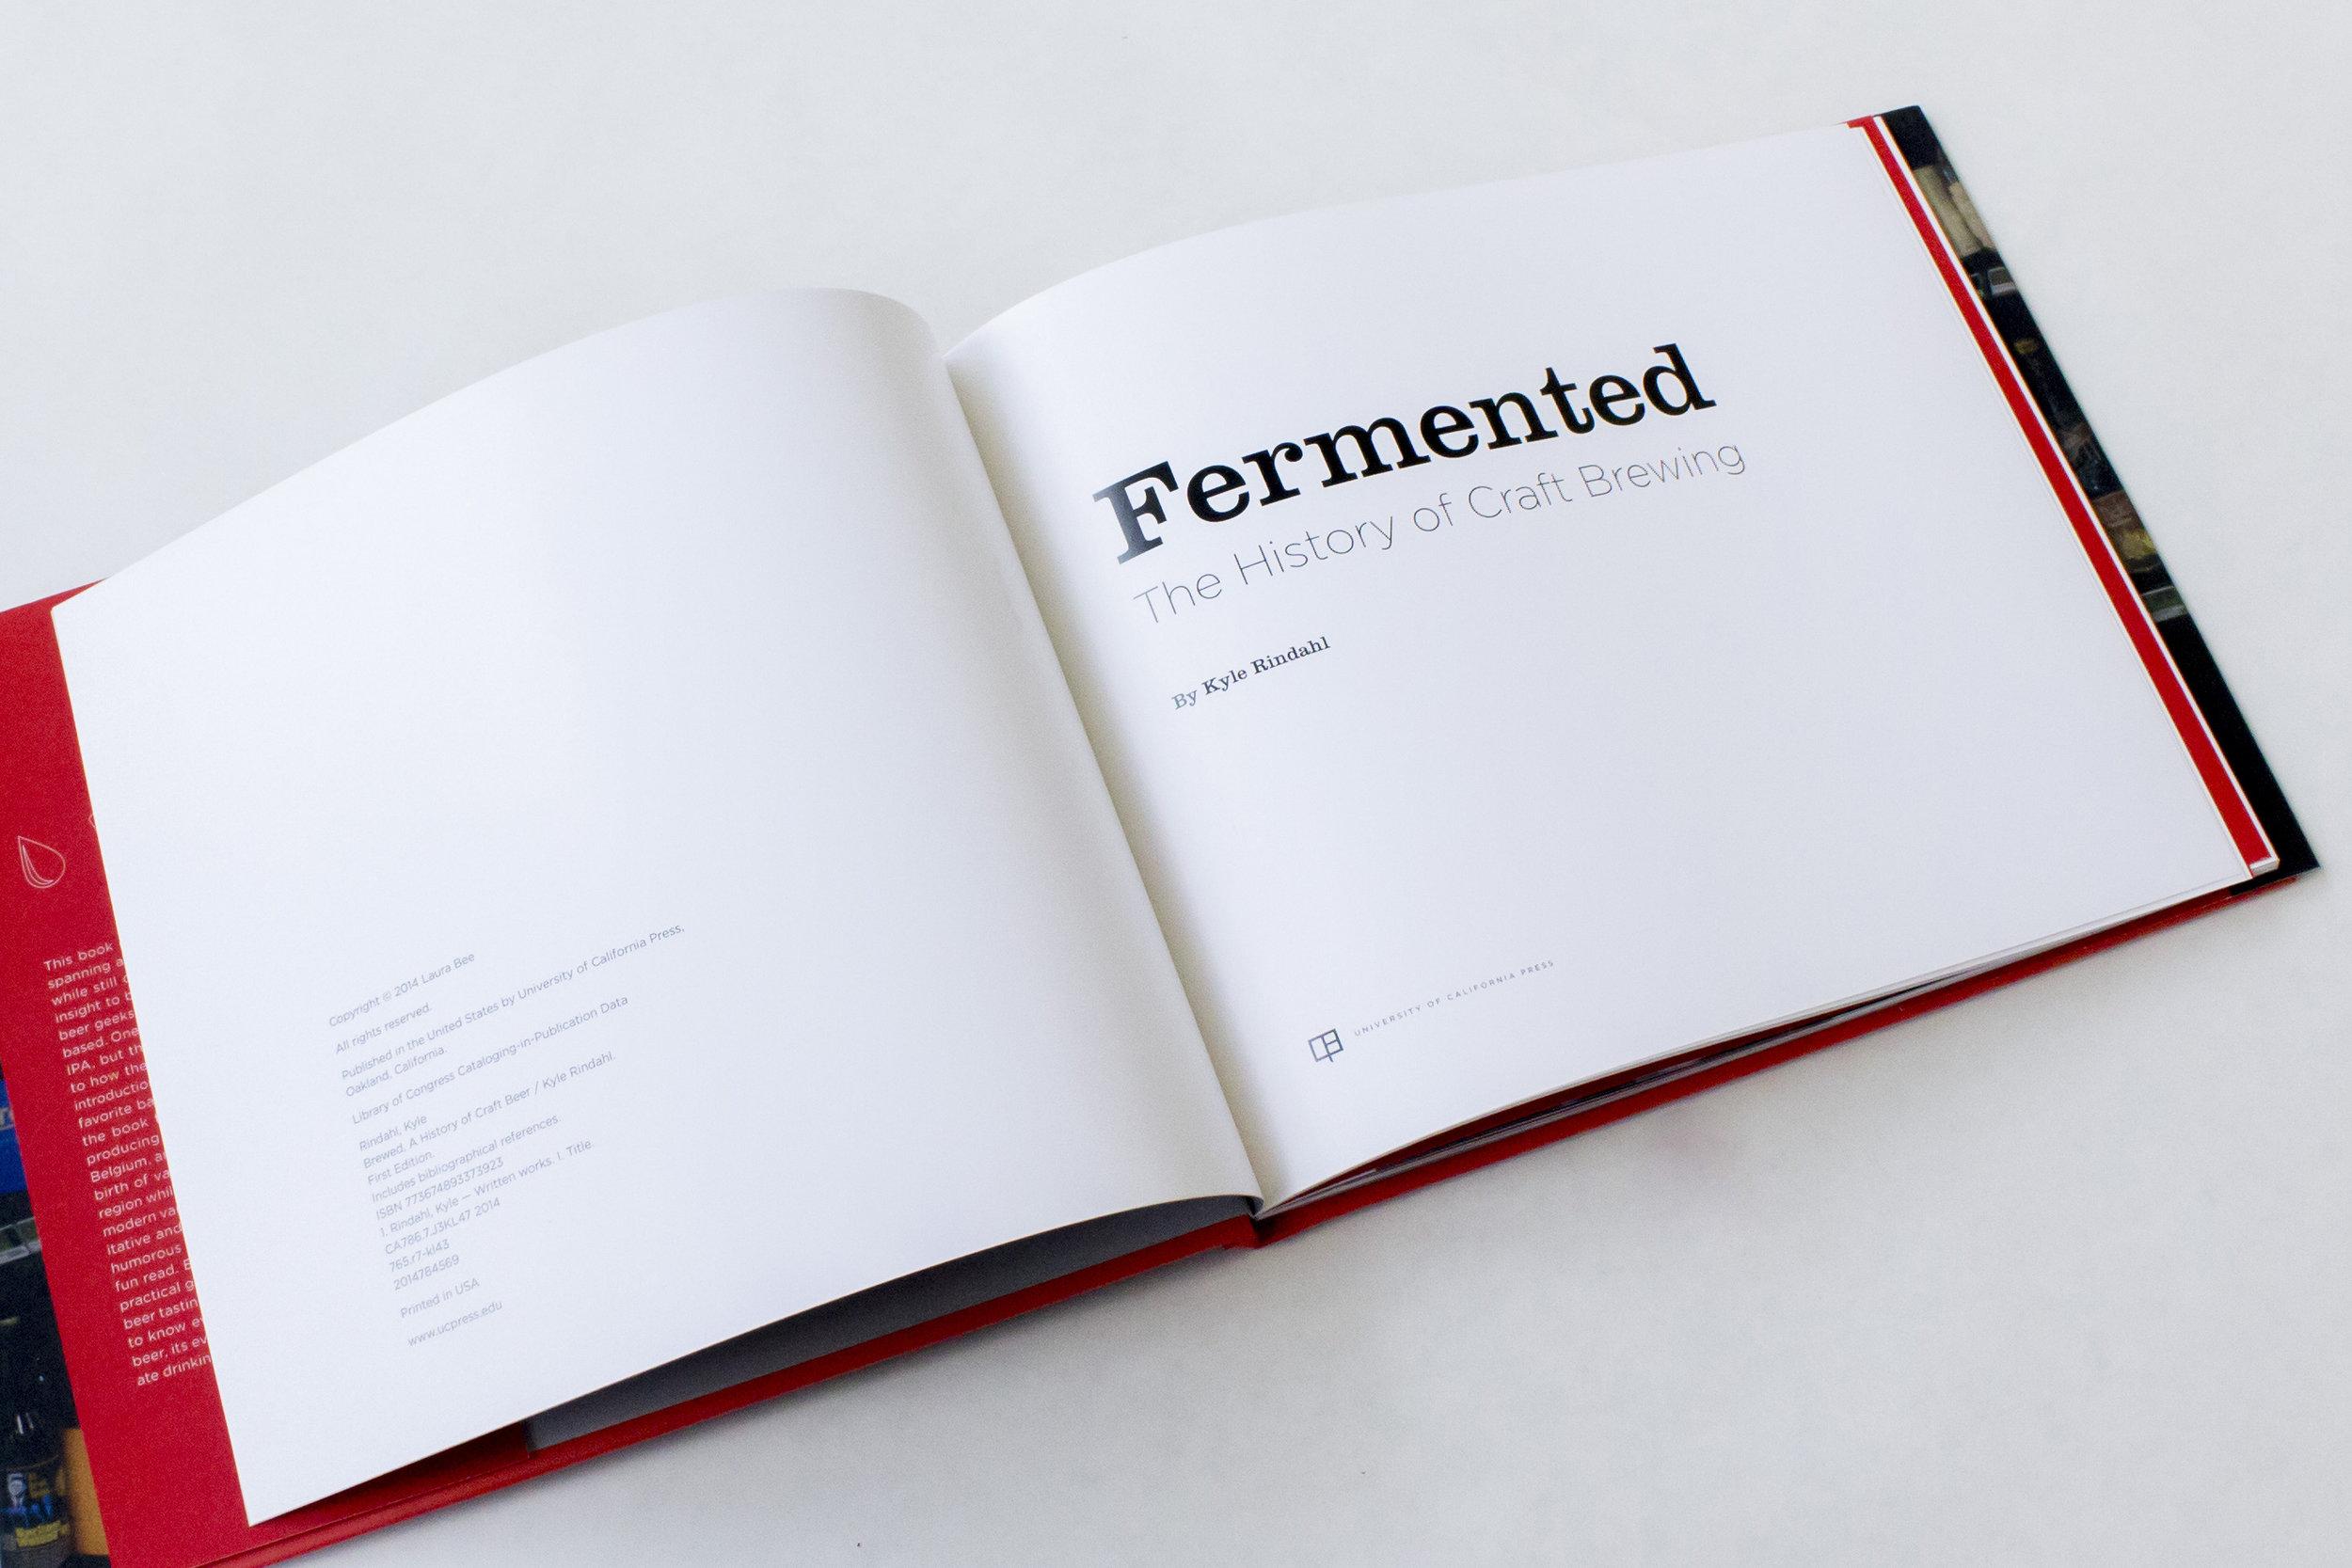 fermented_open.jpg